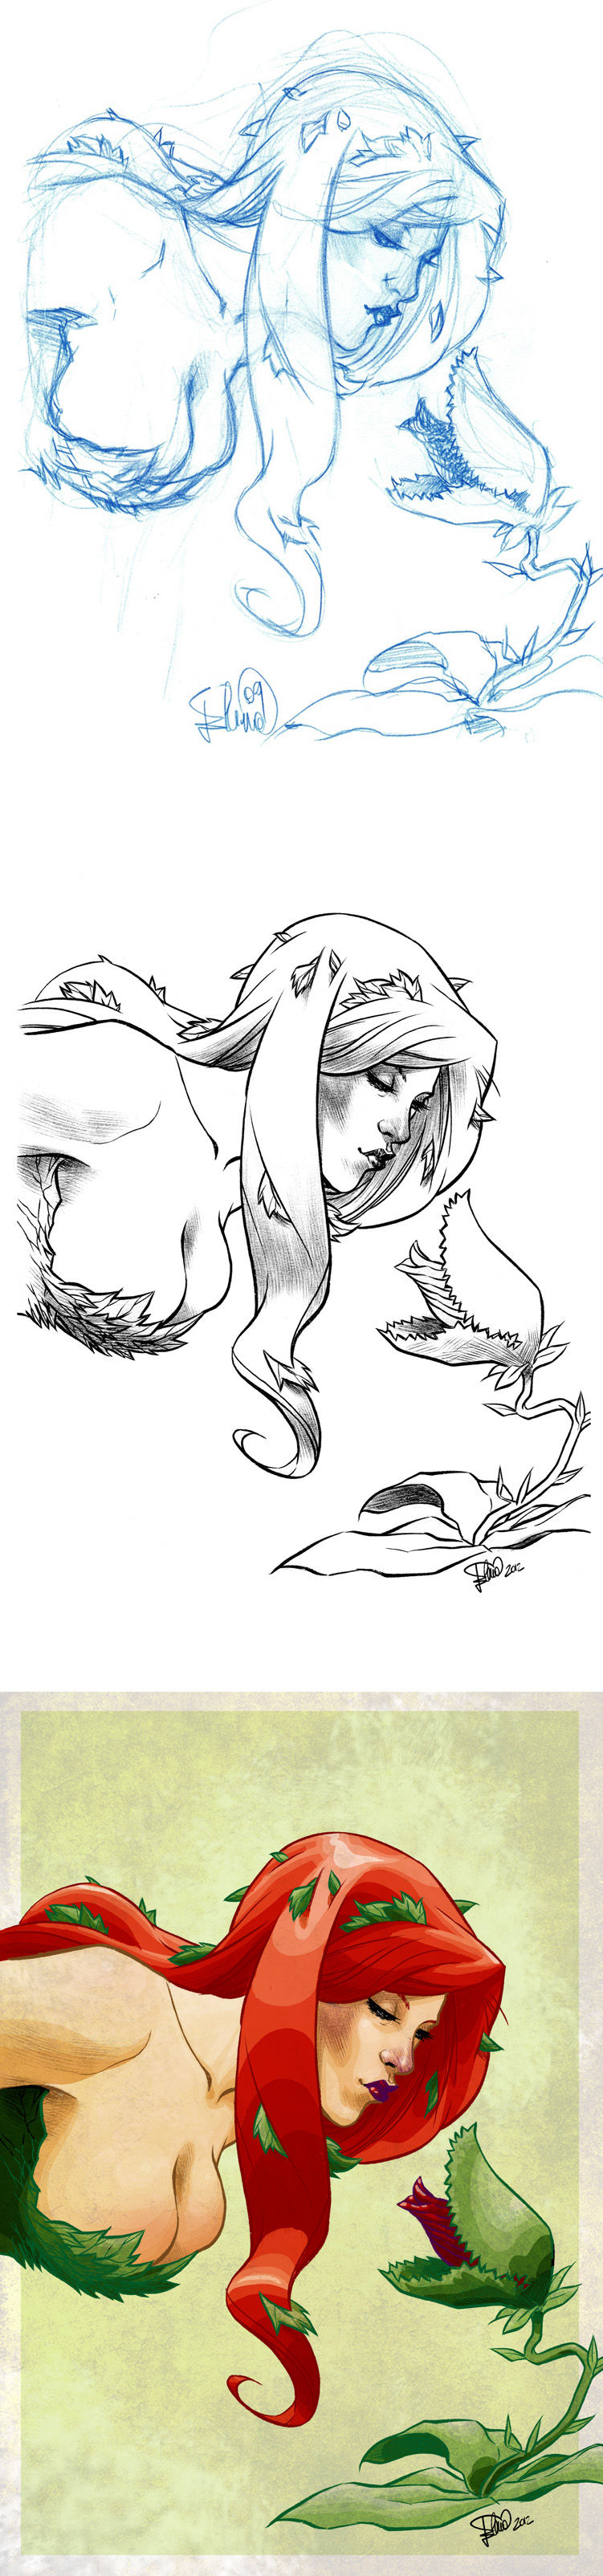 Poison Ivy...progress! by elena-casagrande